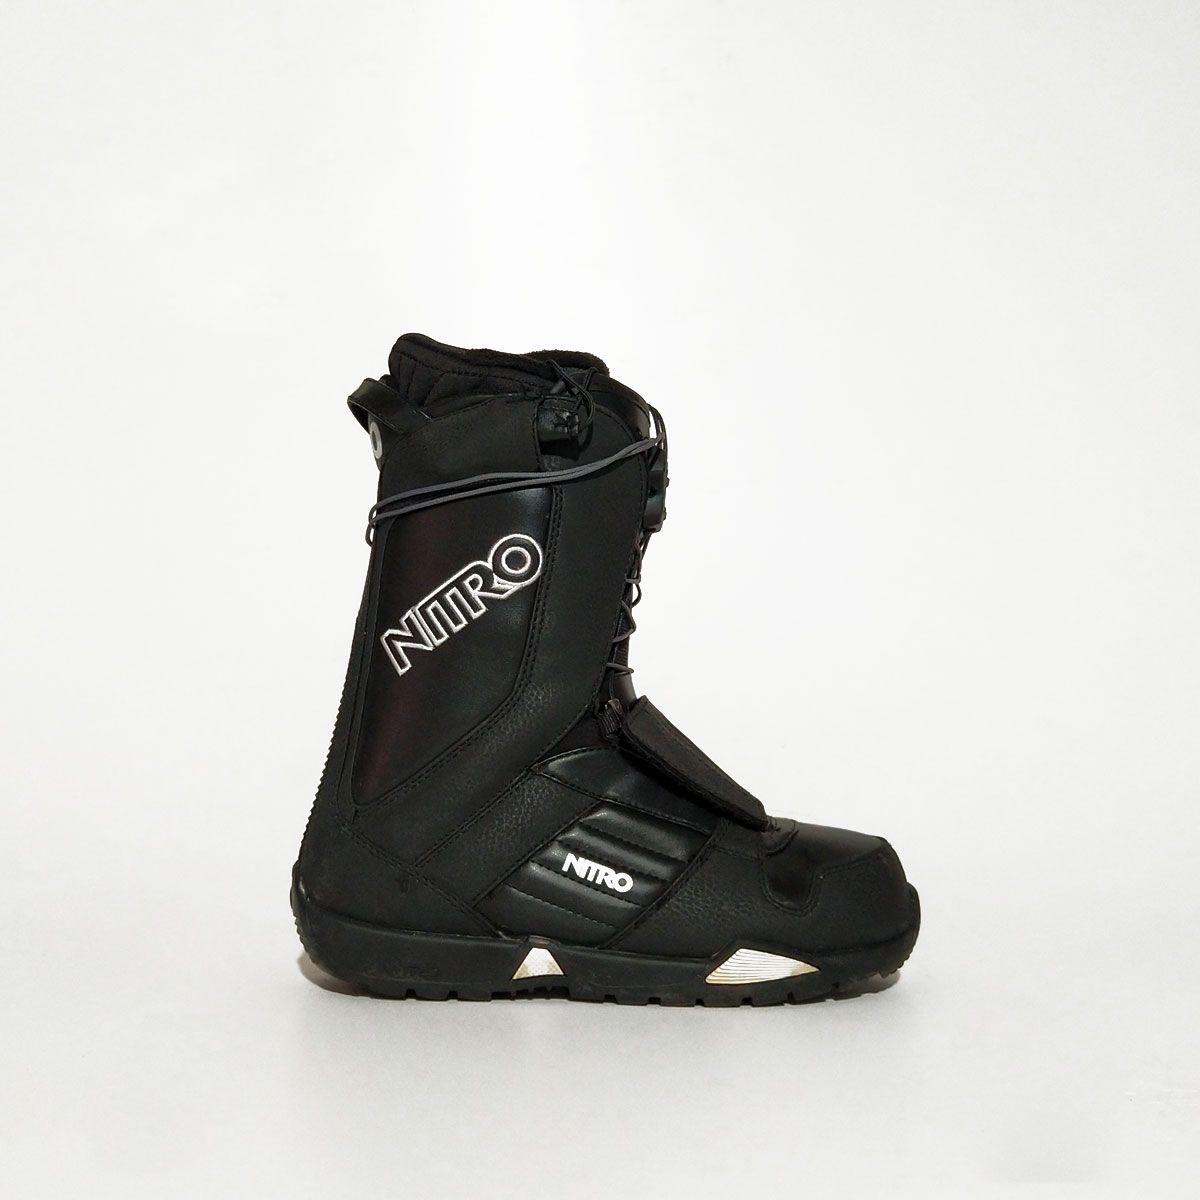 boots-nitro-tls-4